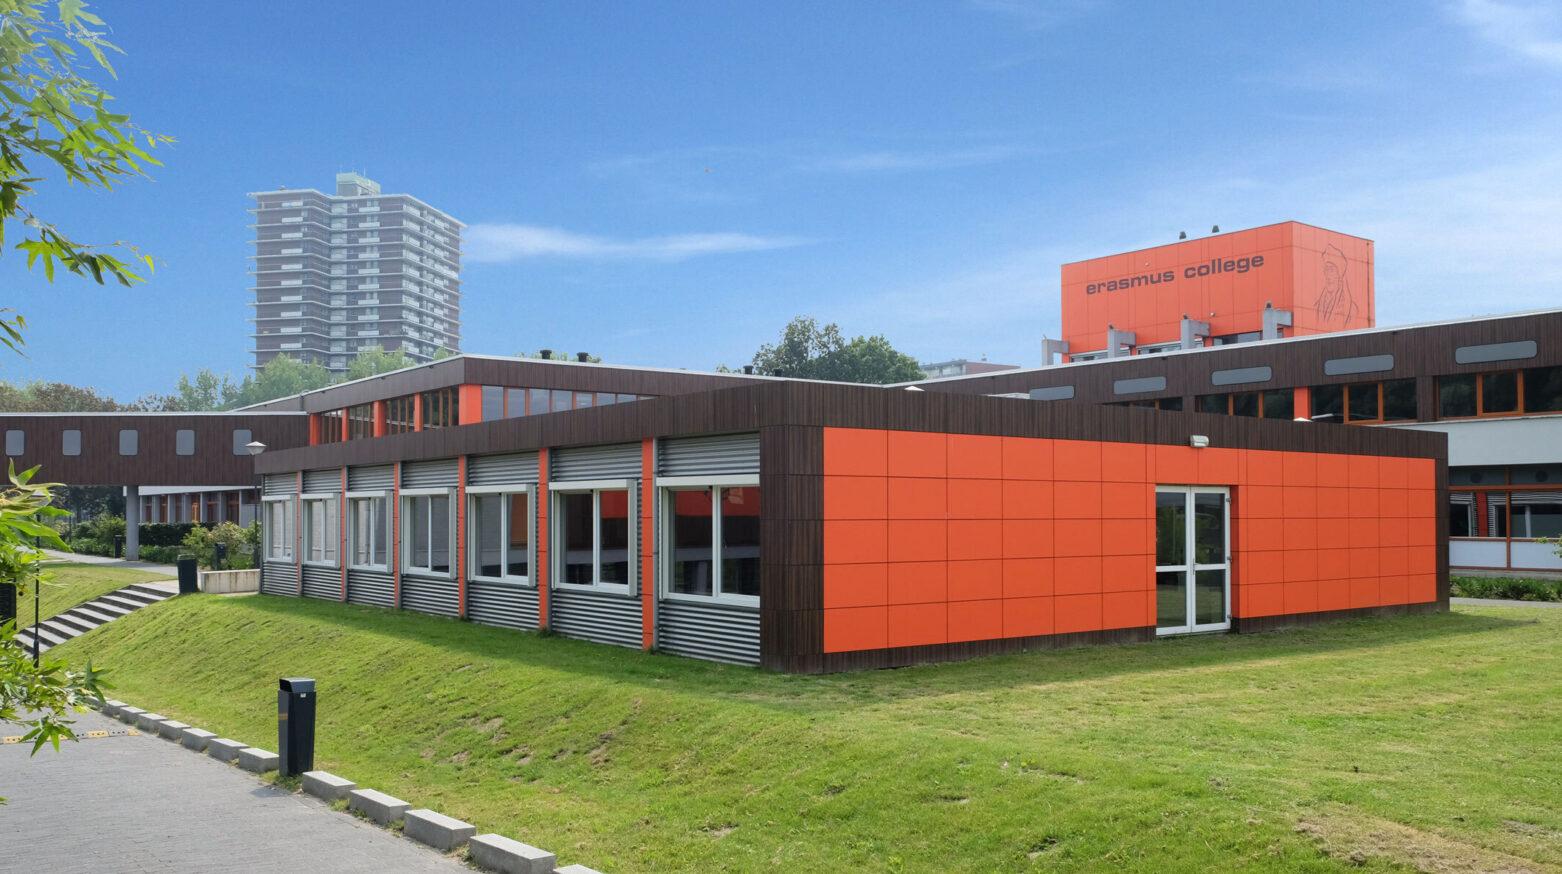 Erasmus college zoetermeer 01